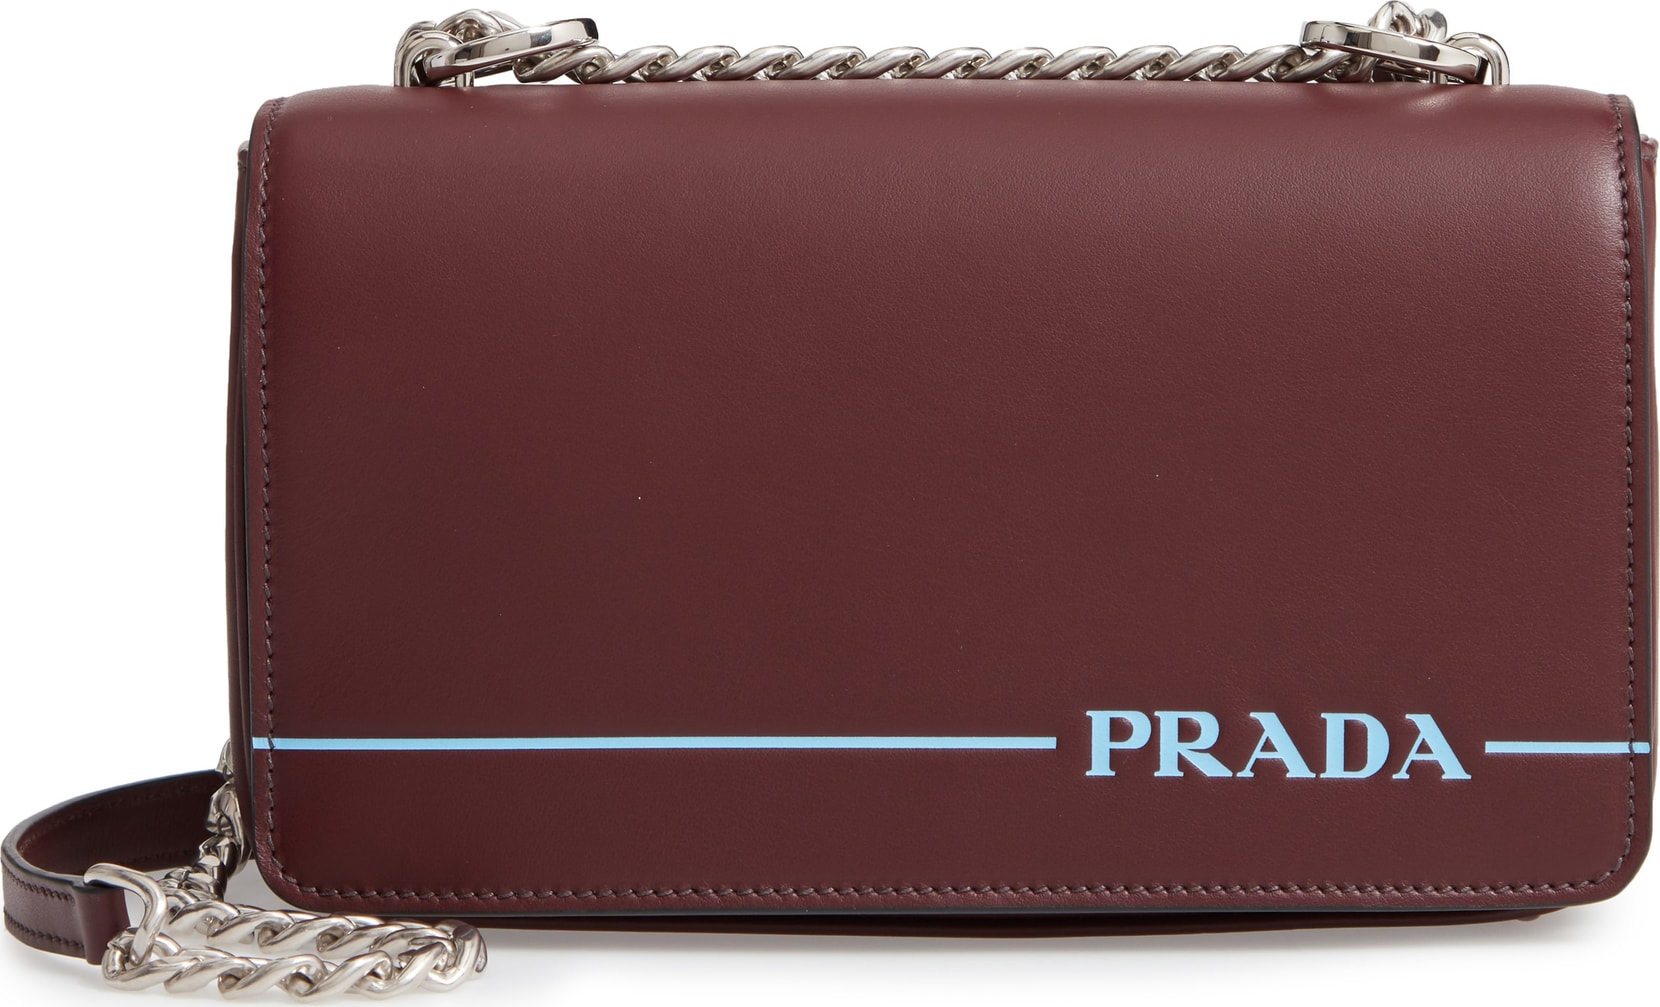 31abddaf coupon code for prada vela flap crossbody bag 07004 ccfe6